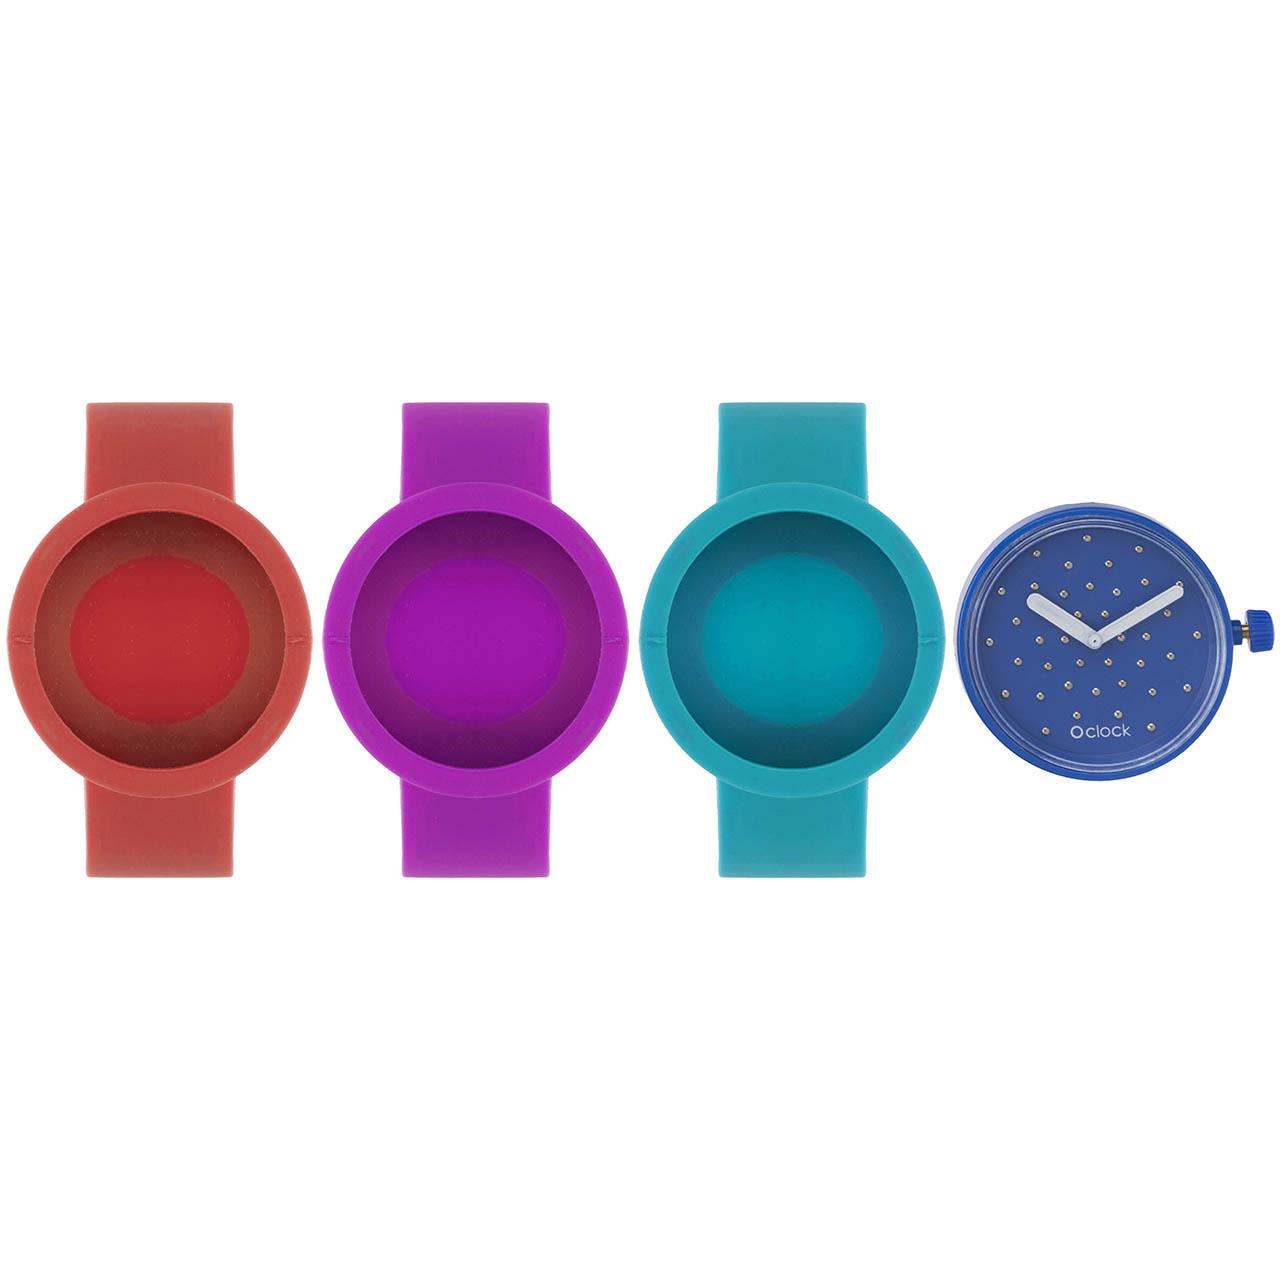 ساعت مچی عقربه ای زنانه او کلاک مدل dial crystal Blu elettrico